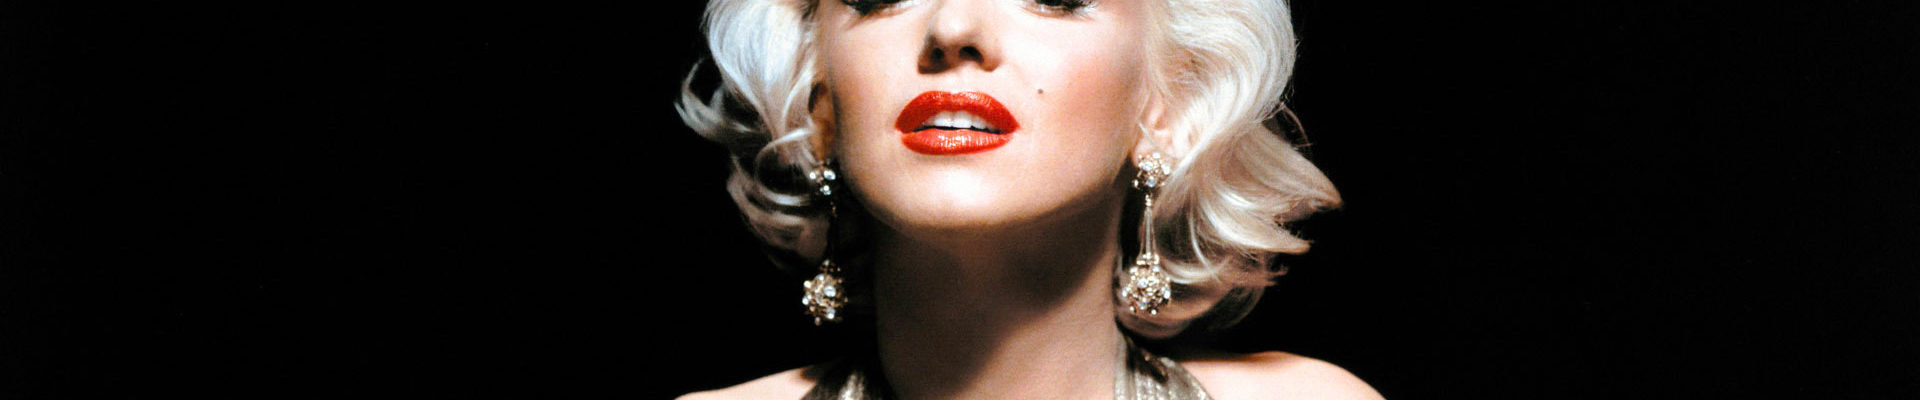 Marilyn Monroe Computer Wallpaper 1920x400 - Мерилин Монро.Икона стиля со своим особым танцем тела